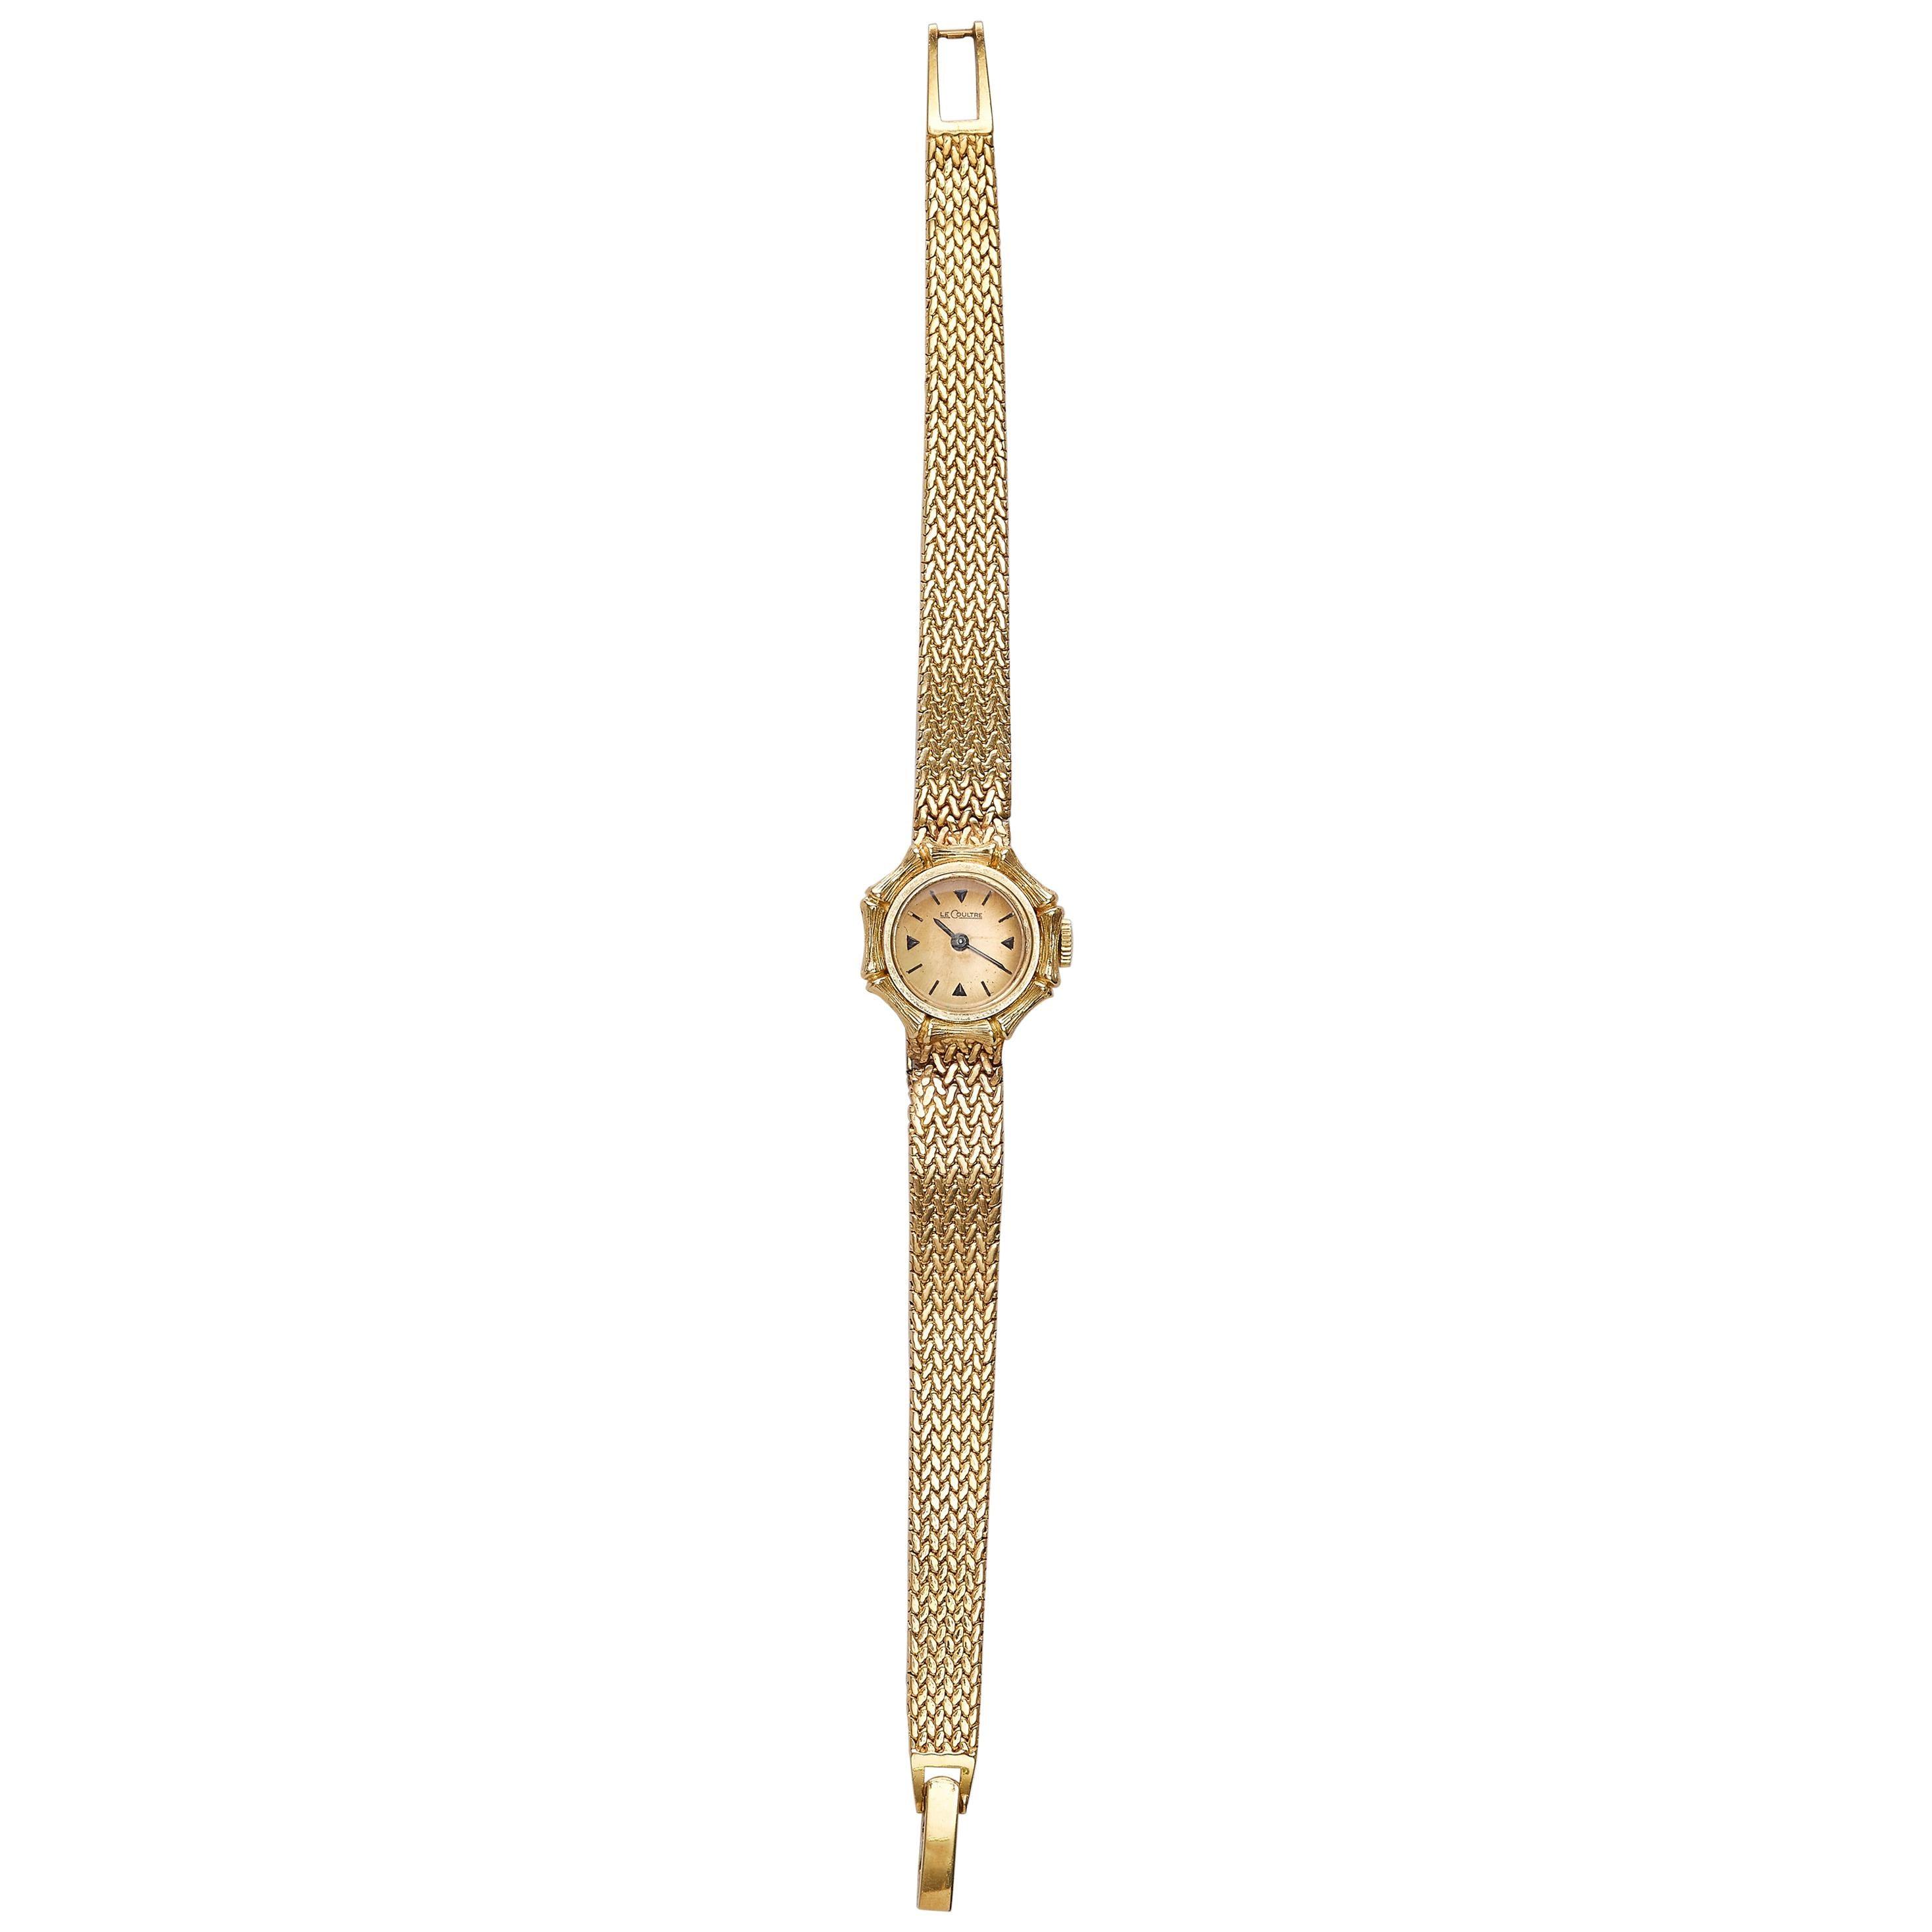 Jaeger-LeCoultre 18k Yellow Gold Lady Wrist Watch